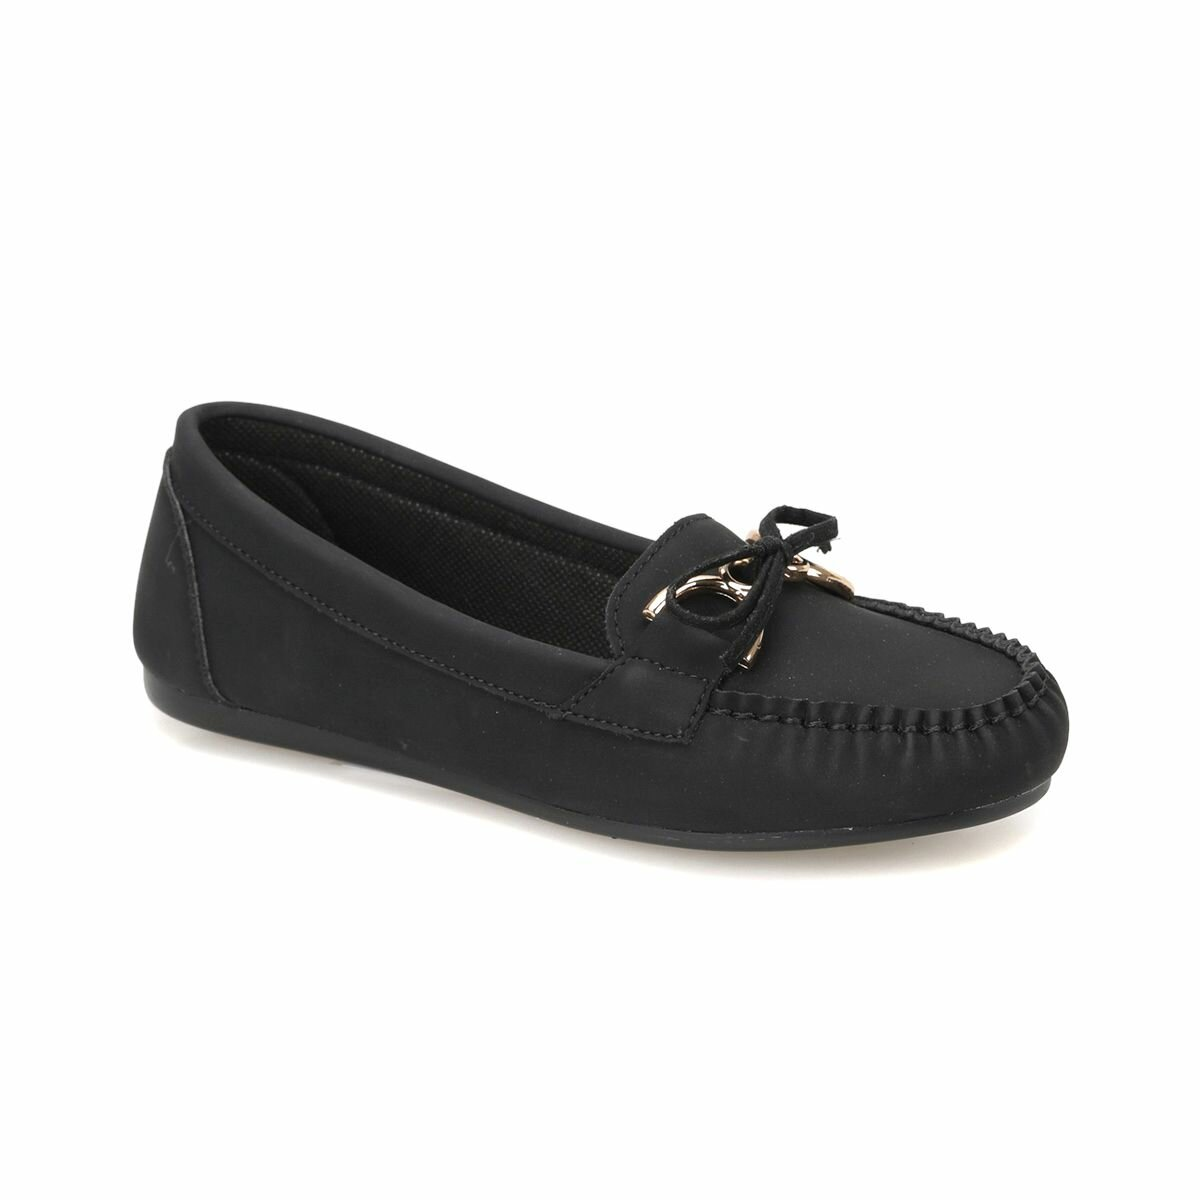 FLO DW18009 Black Women Loafer Shoes Miss F